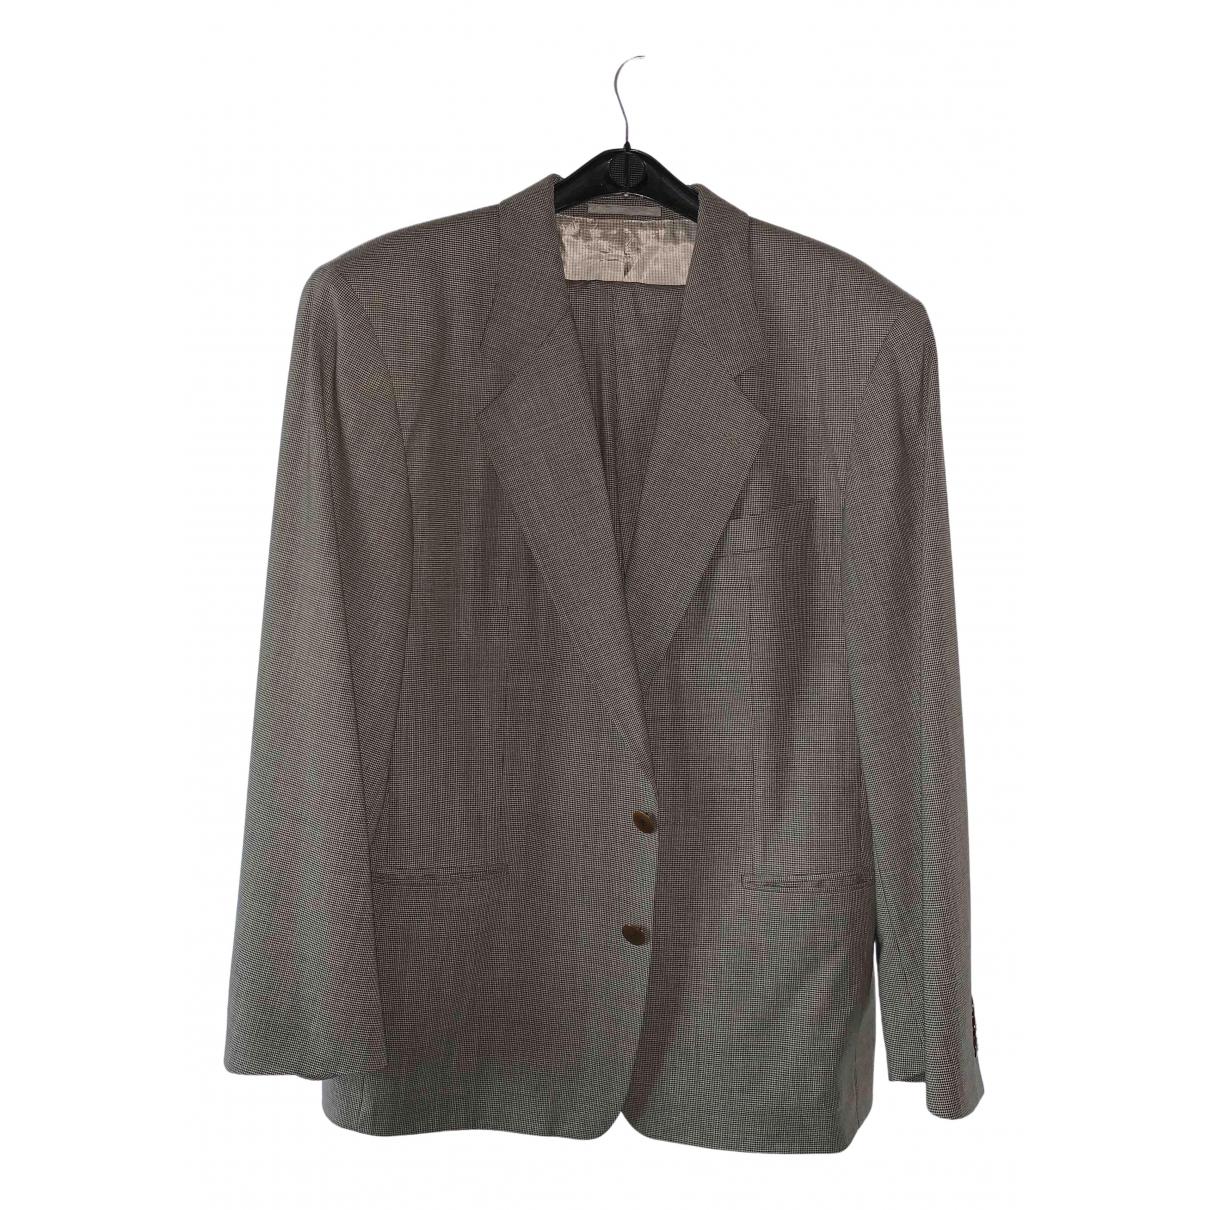 Hugo Boss - Costumes   pour homme en laine - anthracite